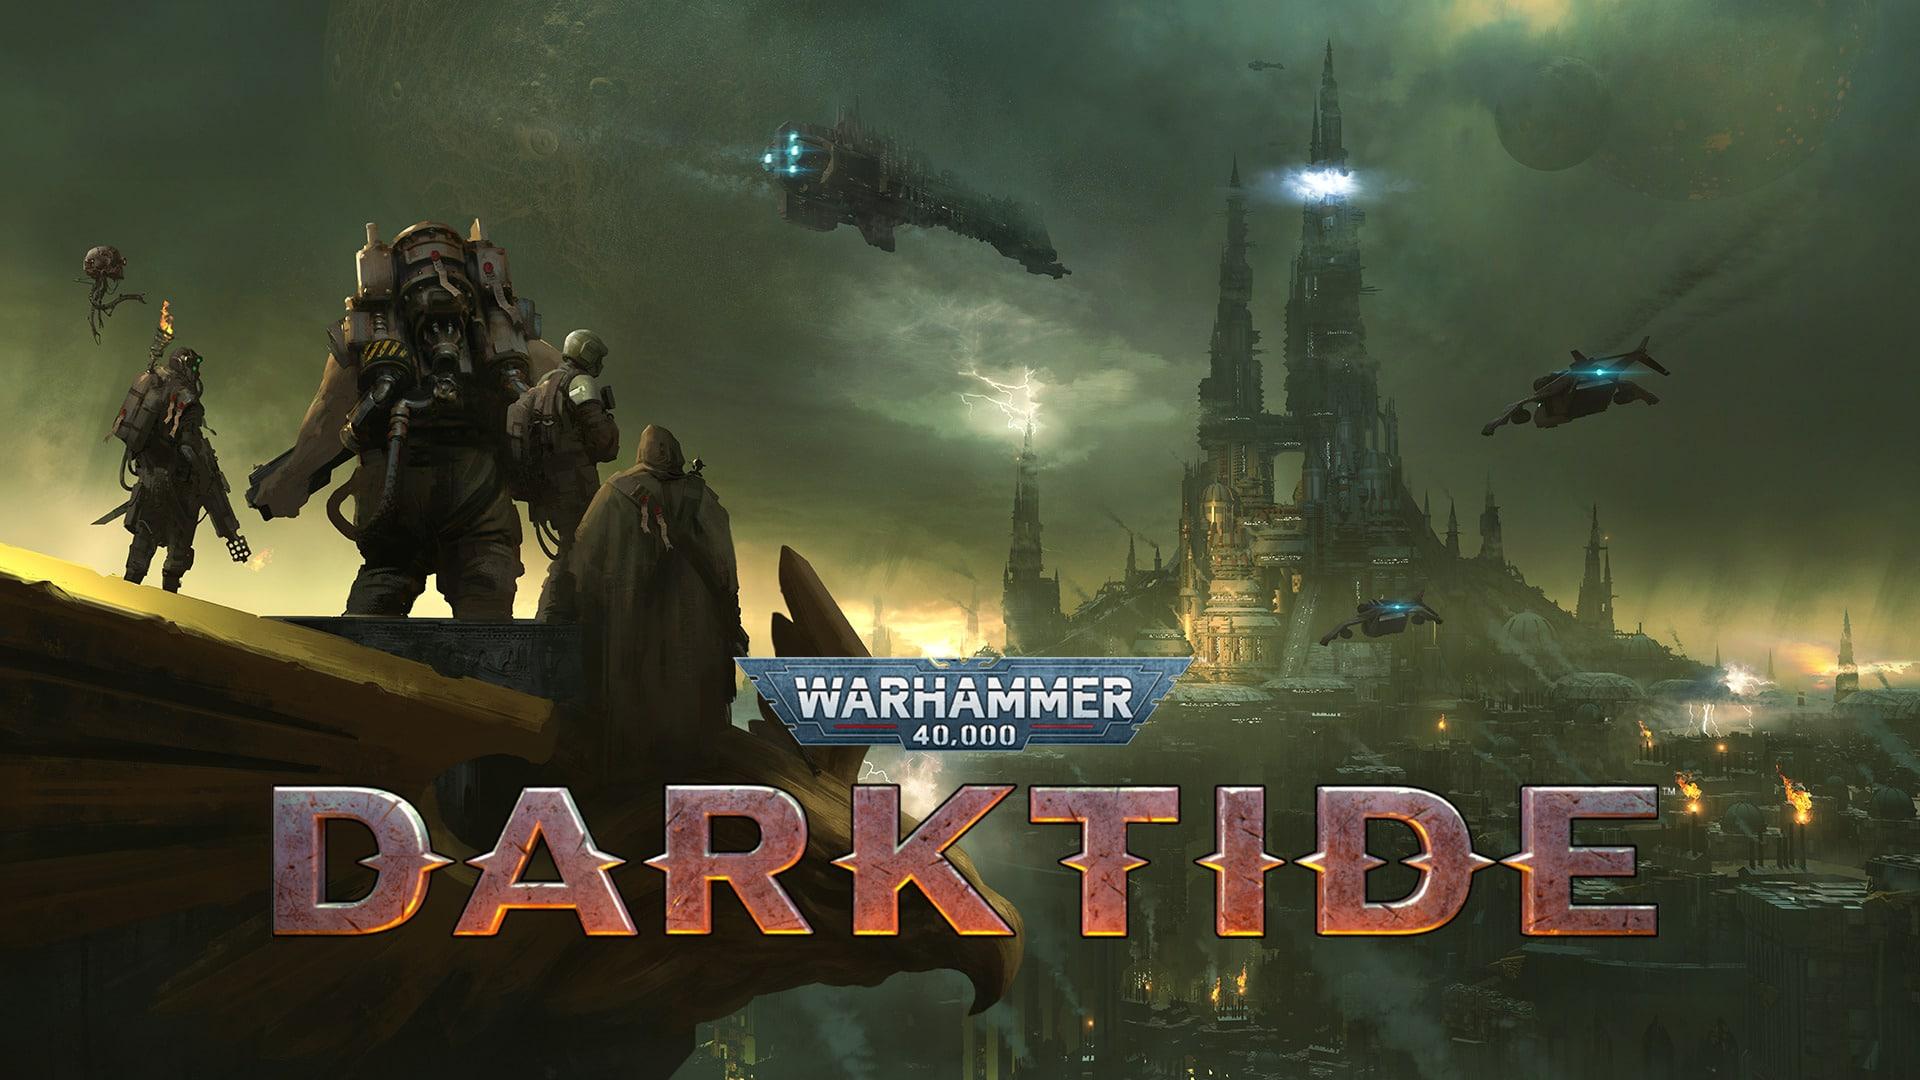 darktide_hp68